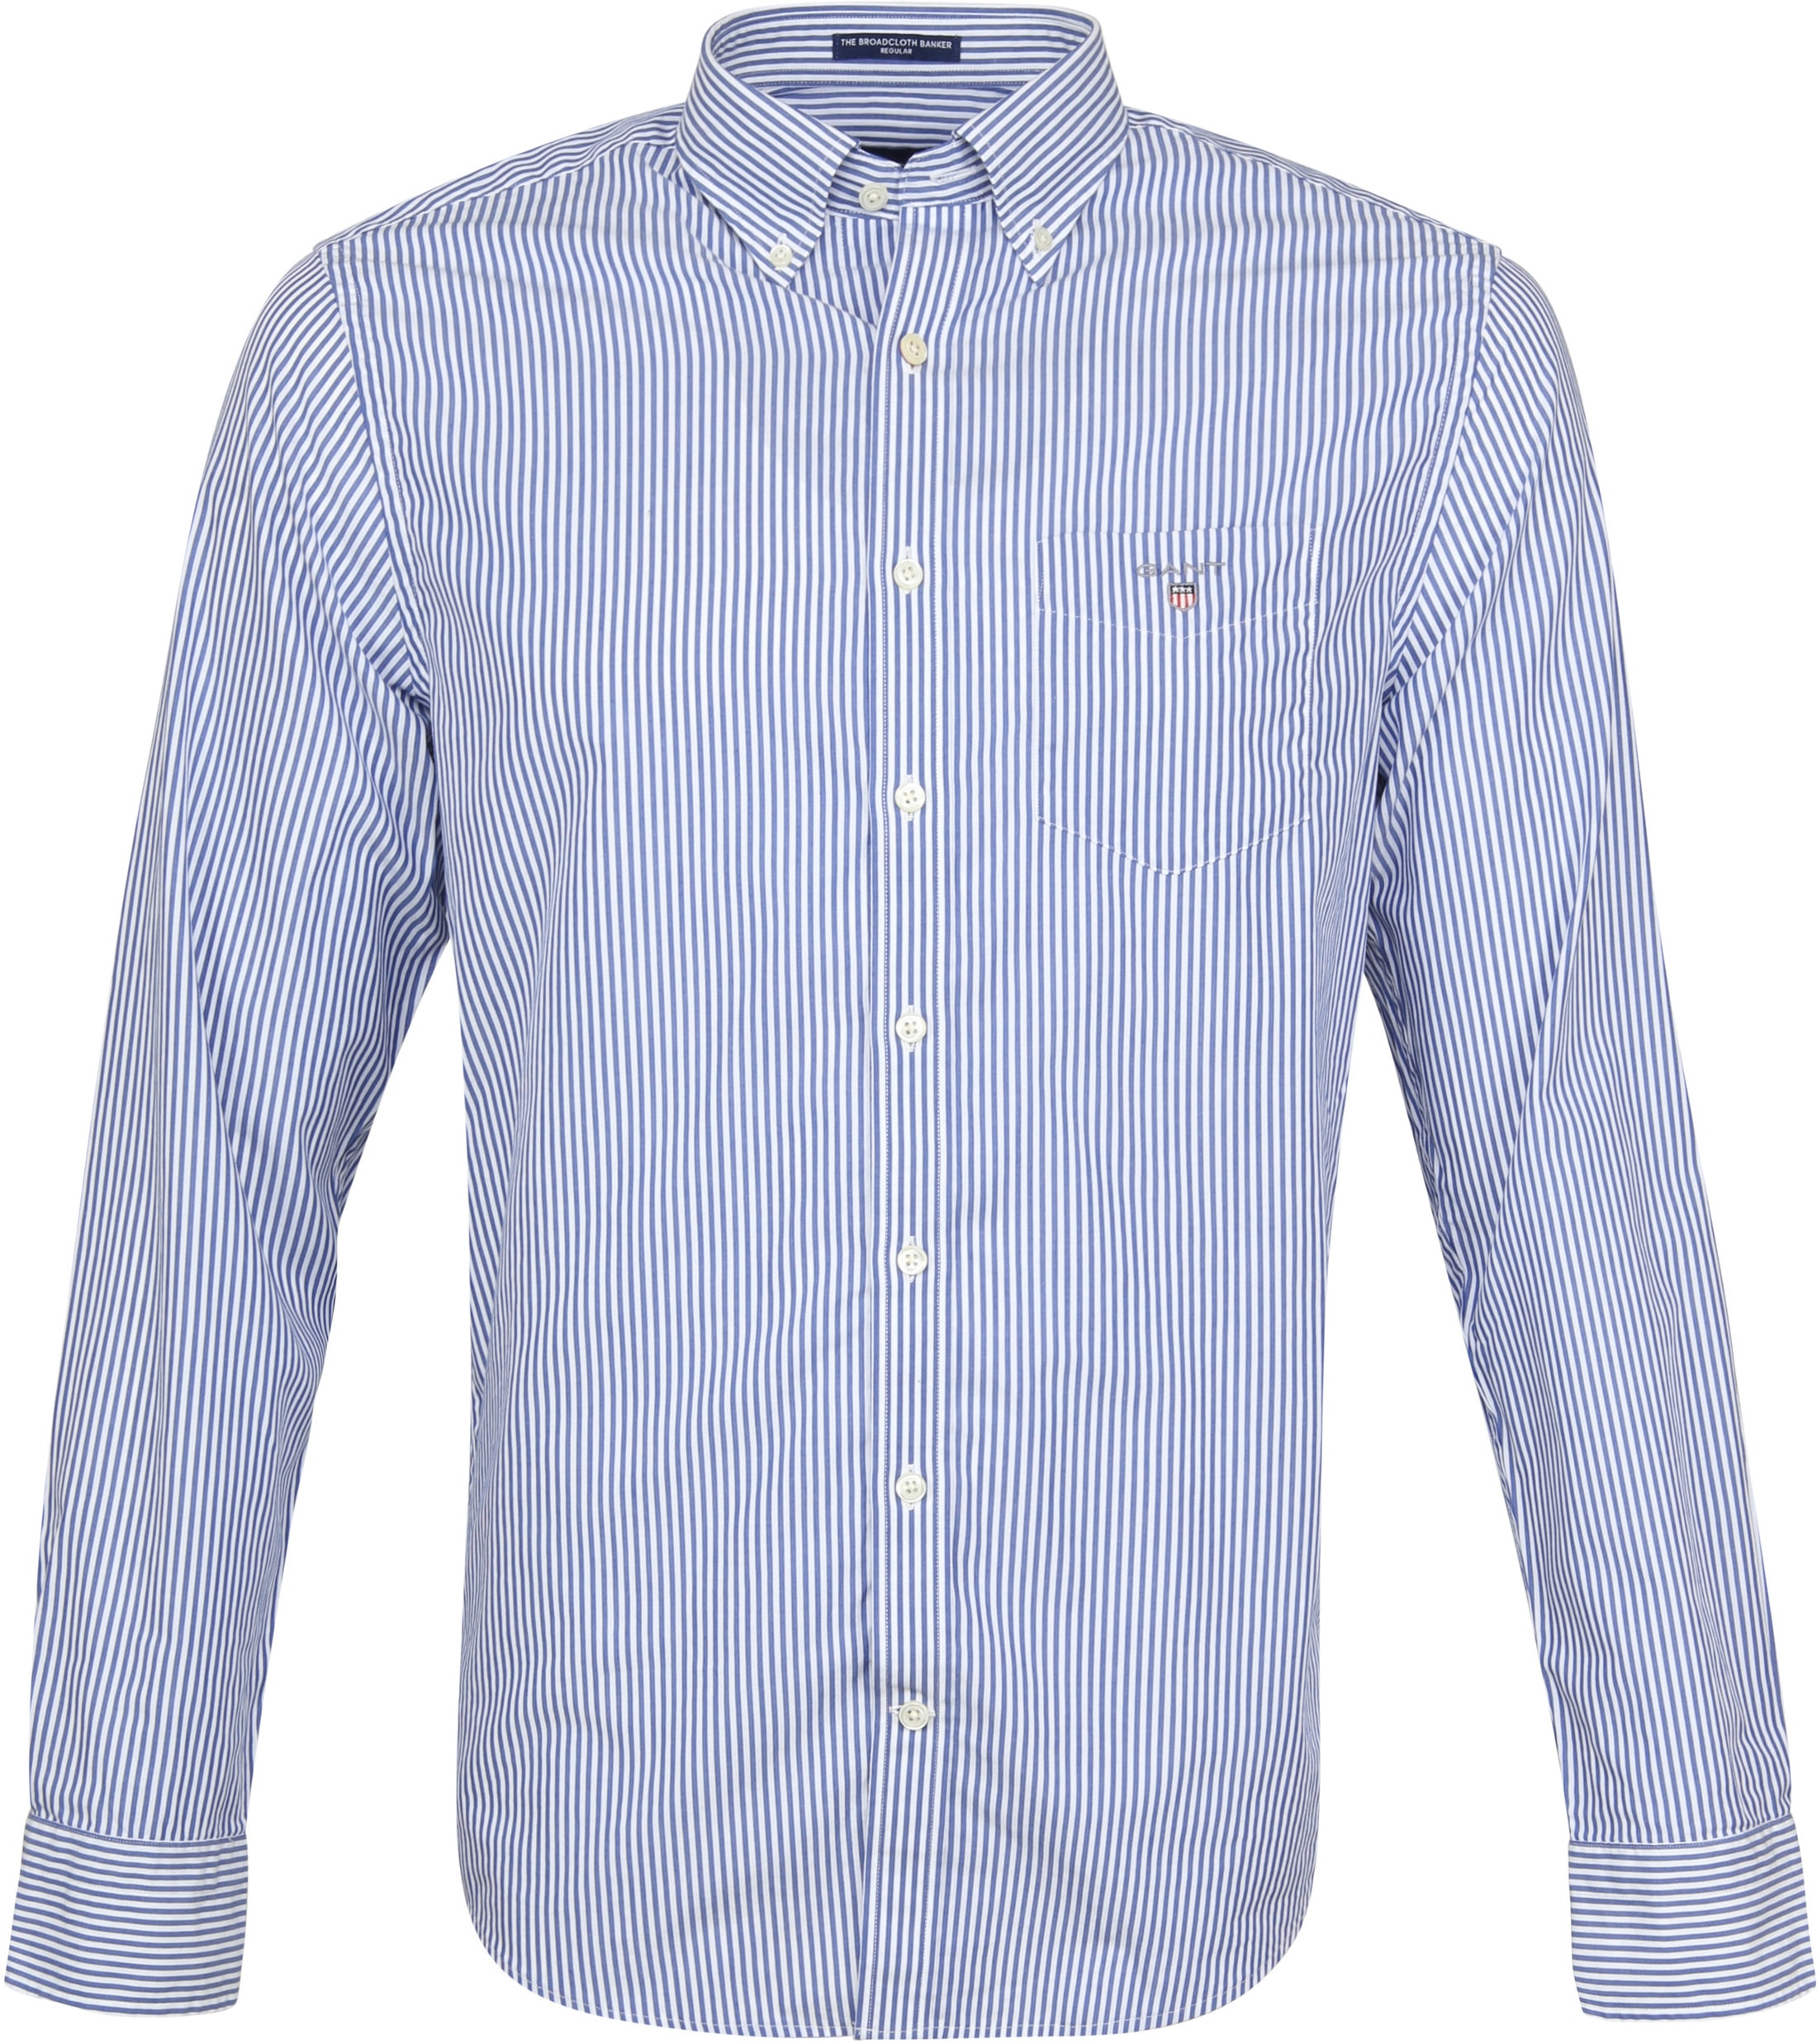 Gant Casual Shirt Stripes Blue foto 0